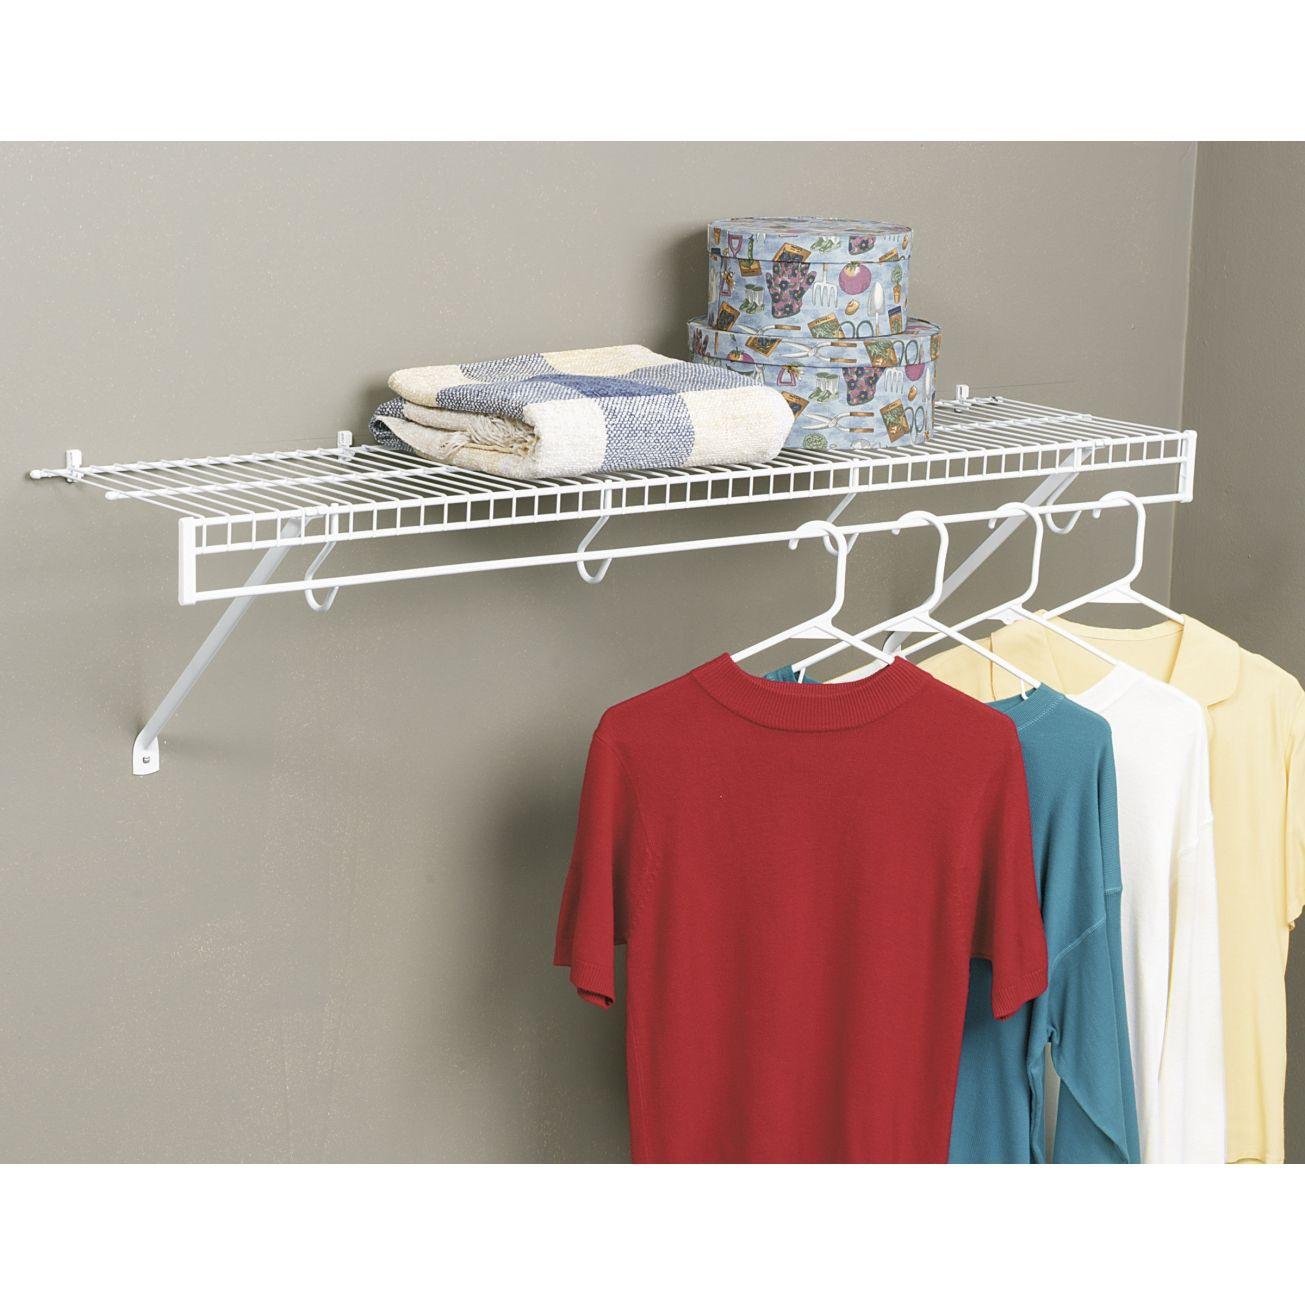 Organizational Hardware Rubbermaid Free Slide Shelf Kit